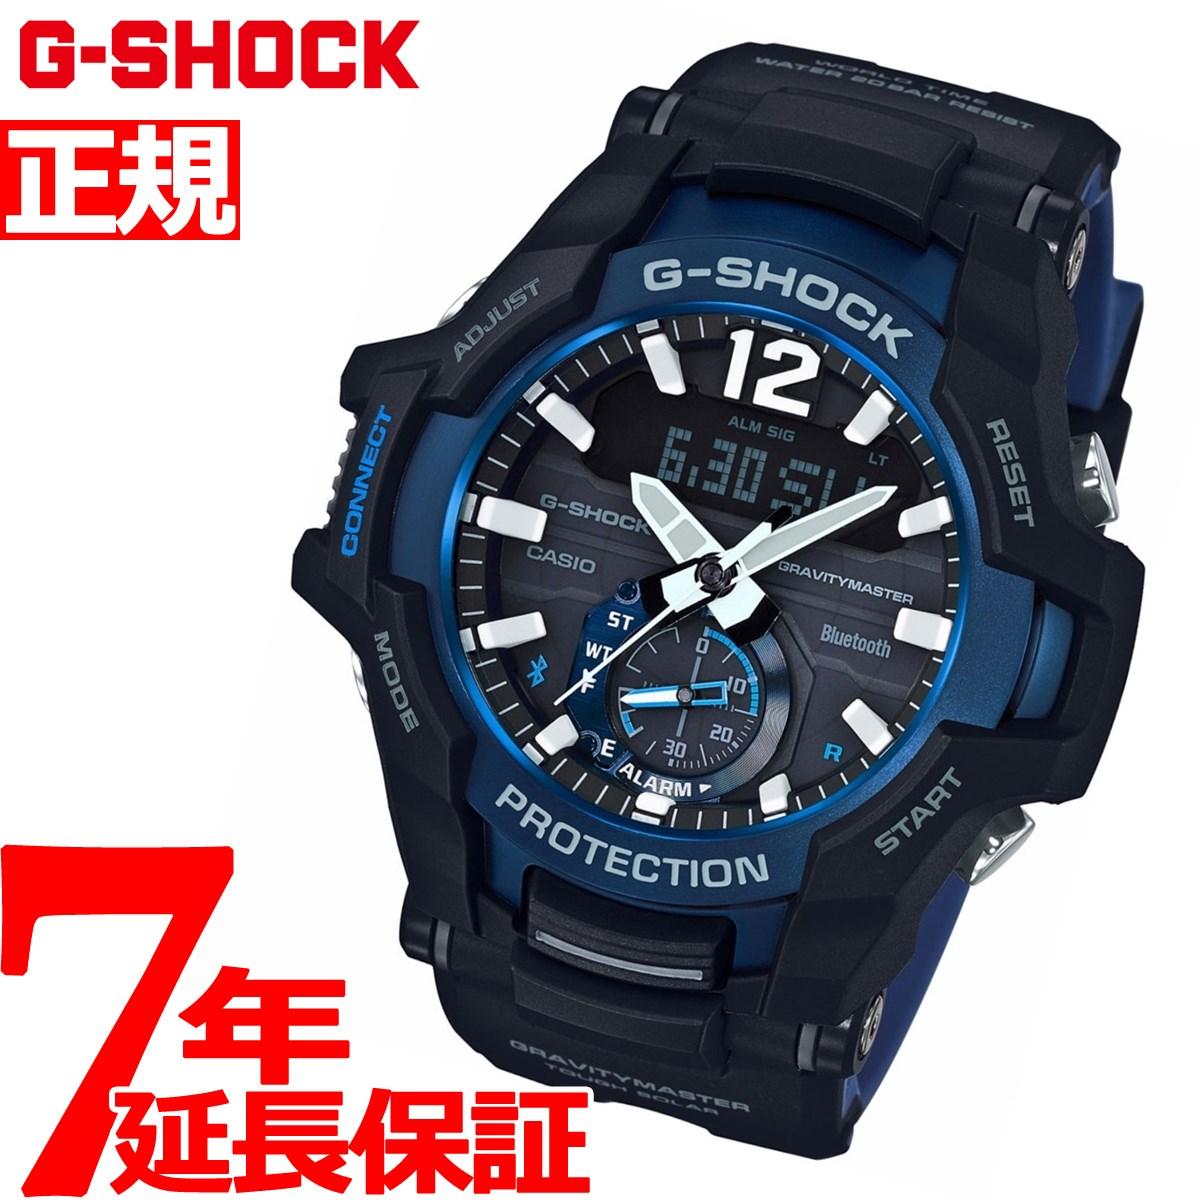 G-SHOCK カシオ Gショック グラビティマスター CASIO 腕時計 メンズ MASTER OF G GR-B100-1A2JF【2018 新作】